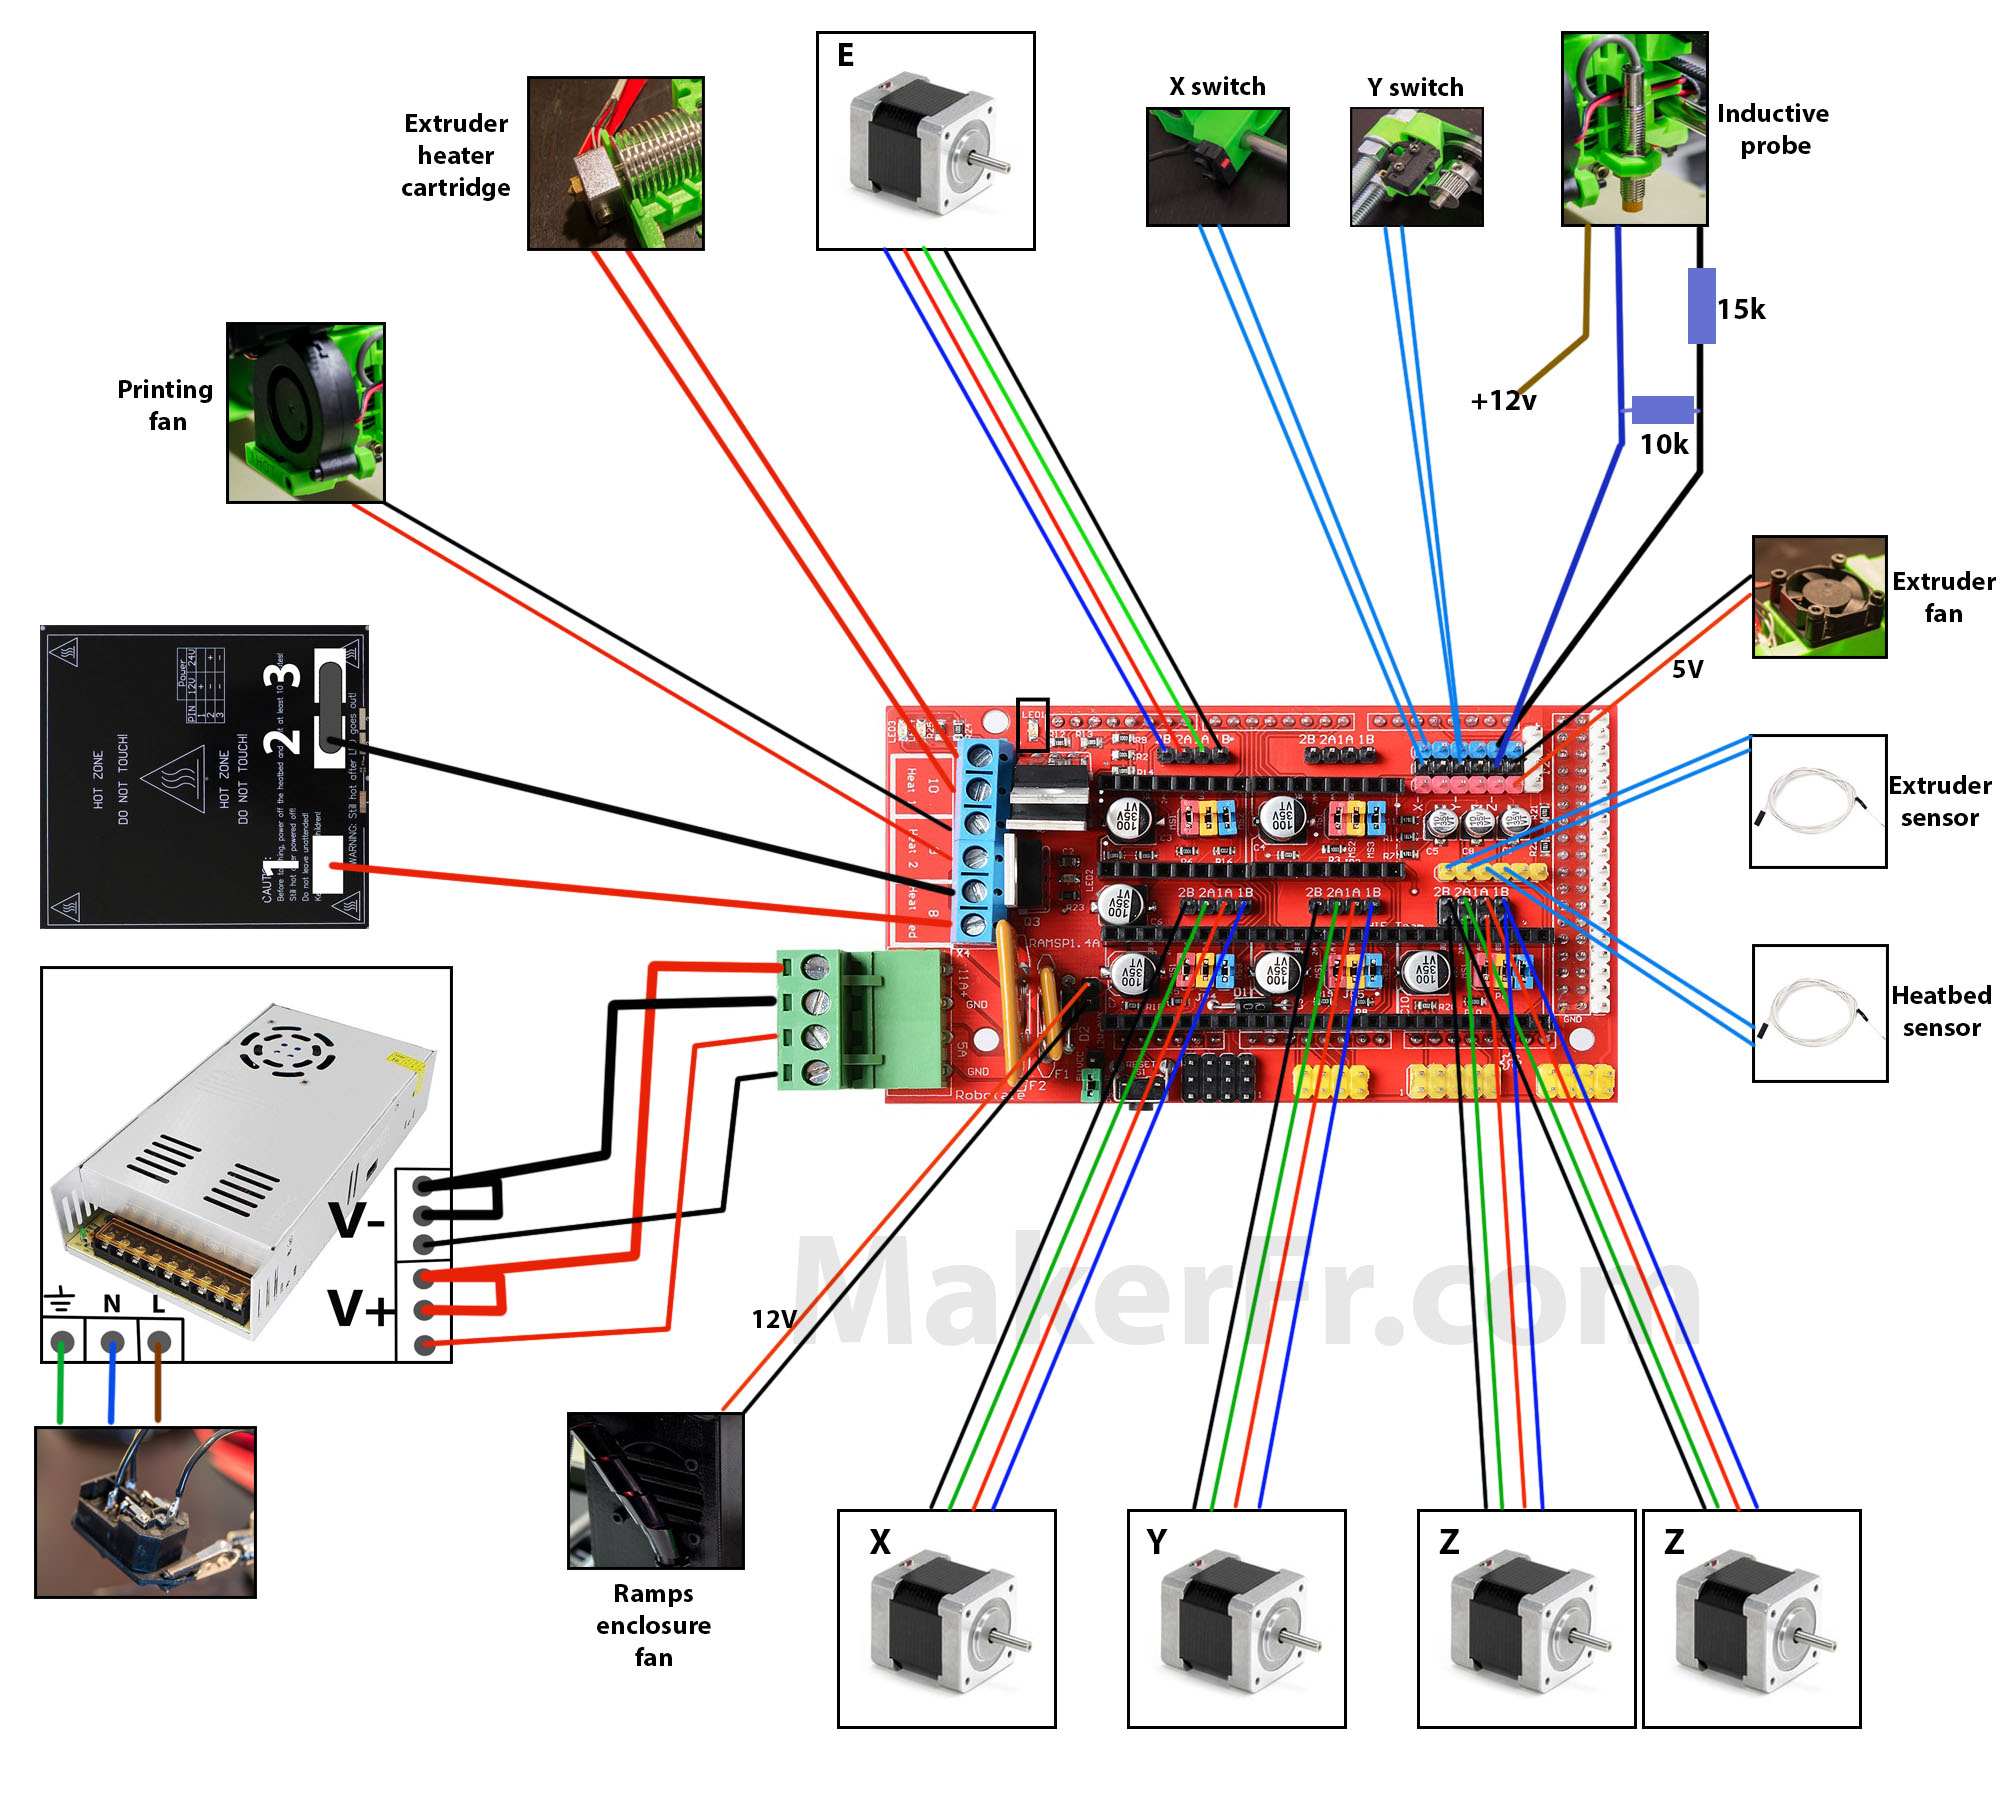 hight resolution of ramps 1 4 stepper motor wiring diagram